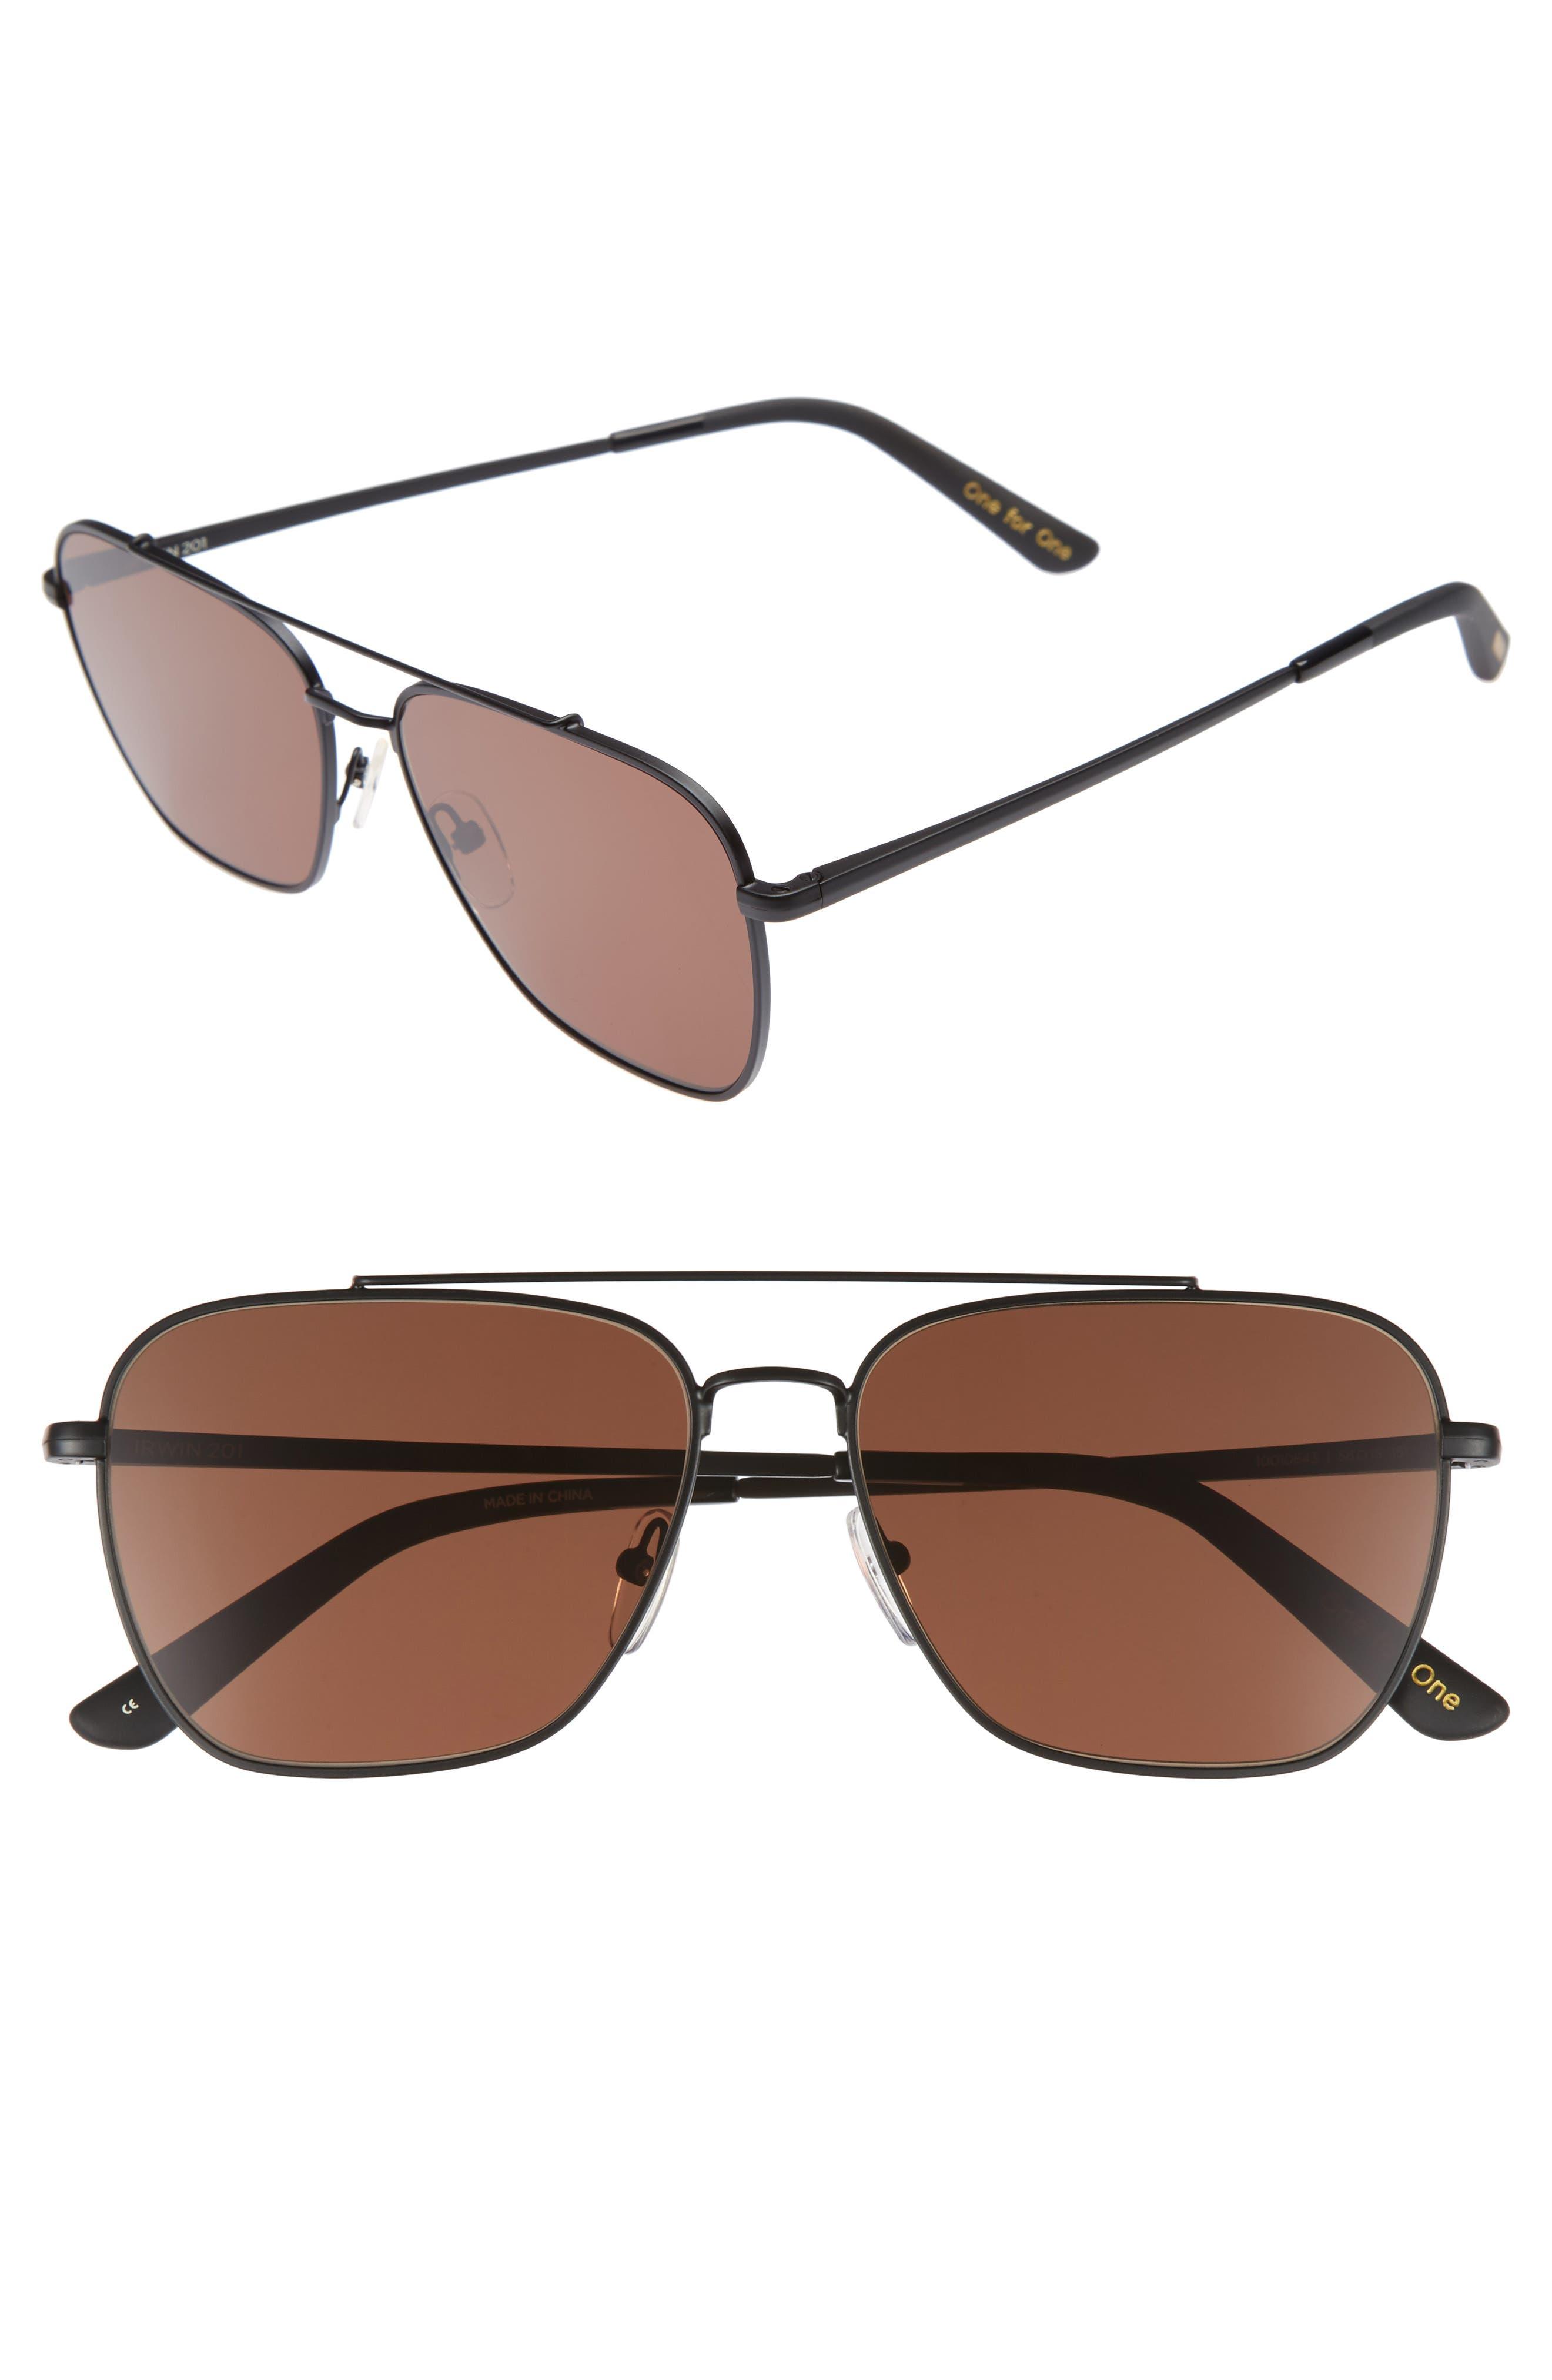 Irwin 58mm Sunglasses,                         Main,                         color, 001